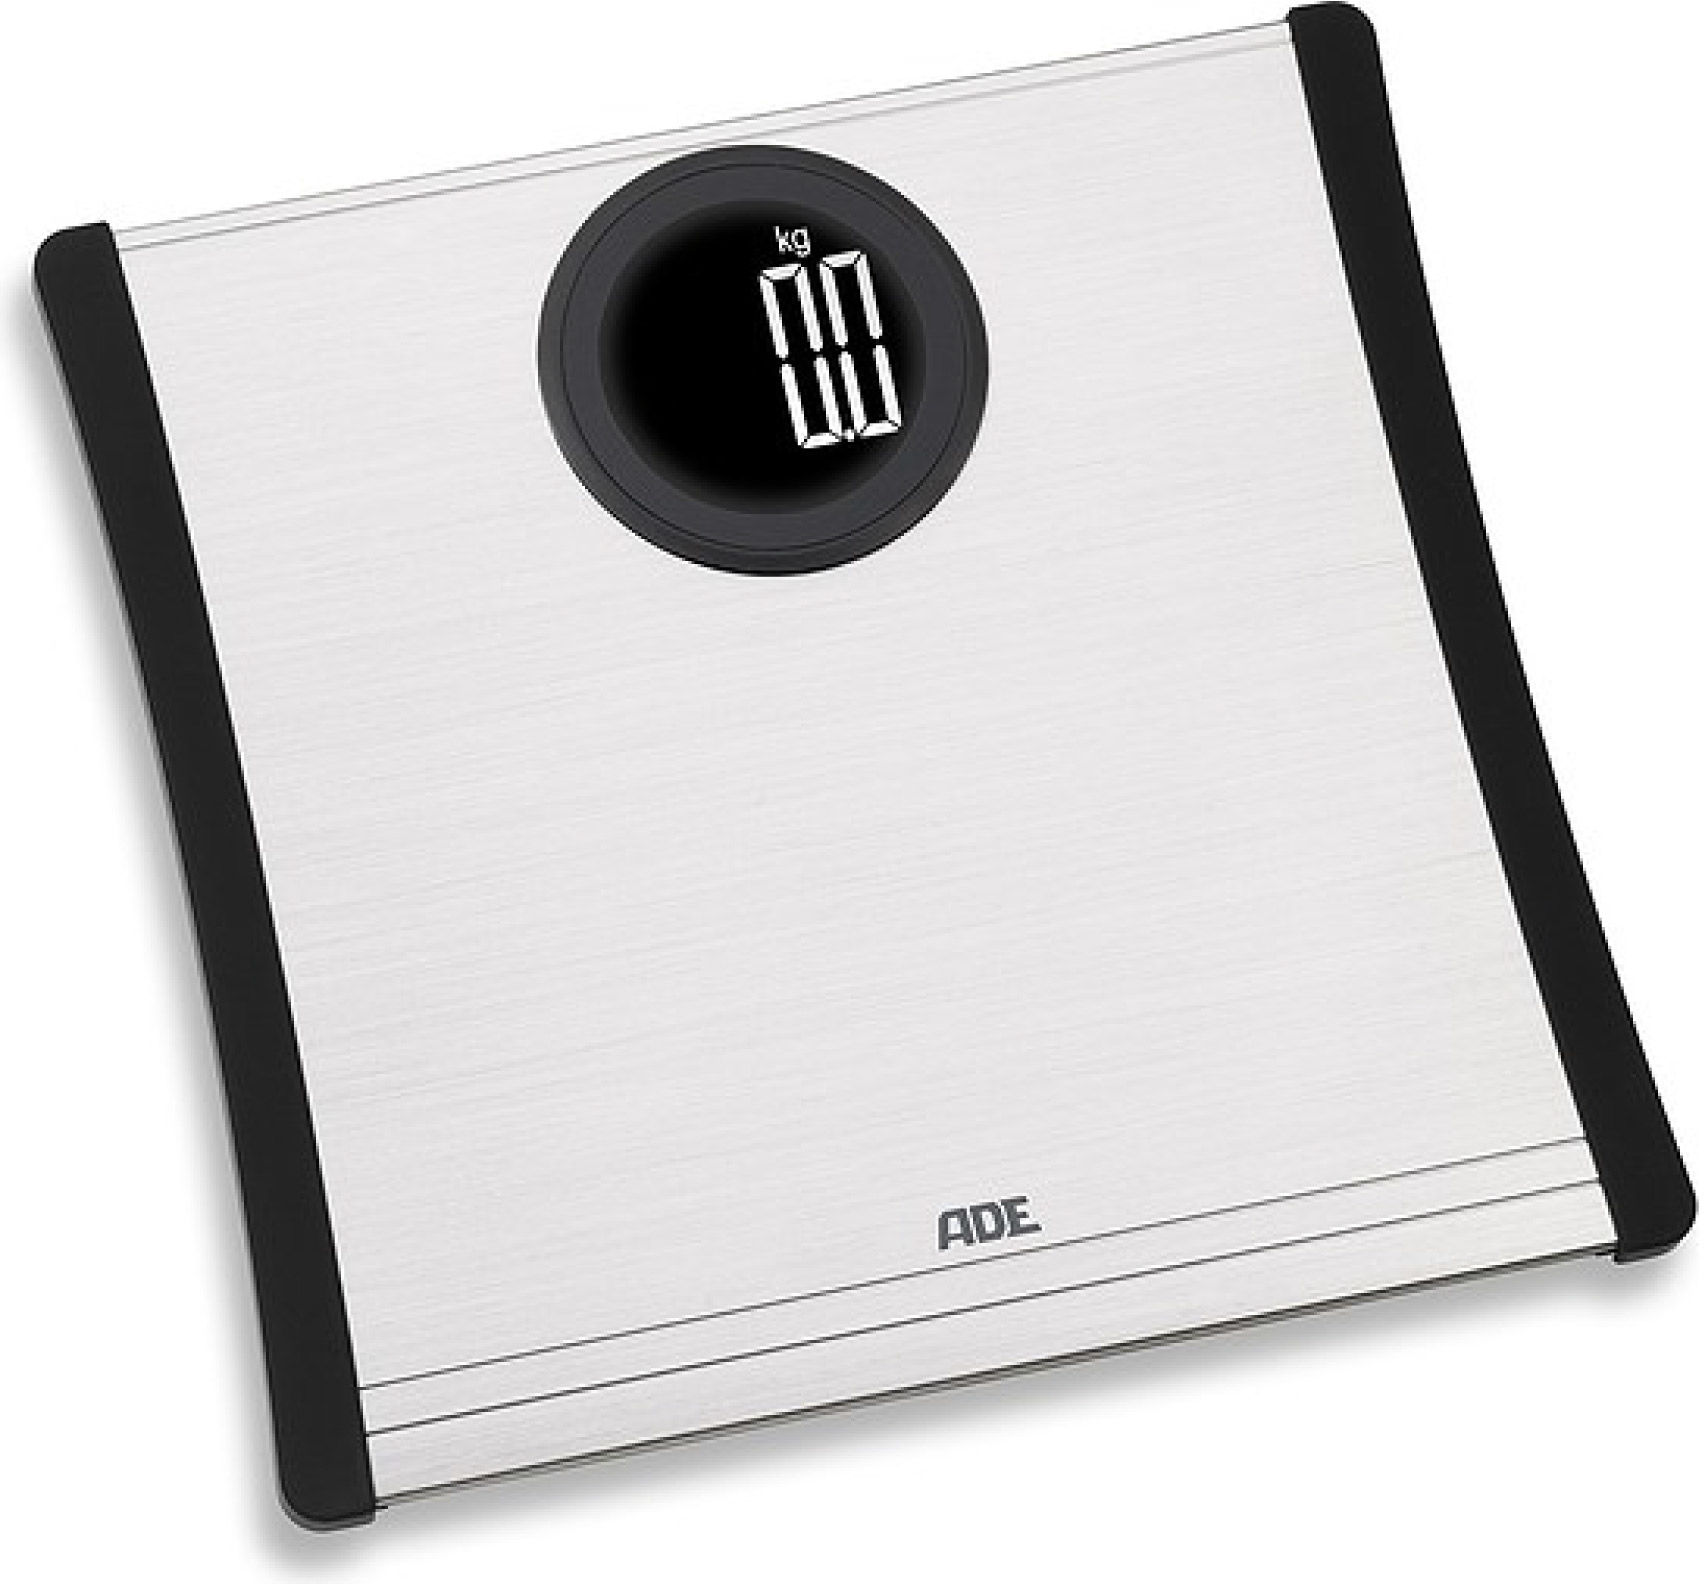 ADE BE1701 Toni Ultralekka, aluminiowa, cyfrowa waga łazienkowa